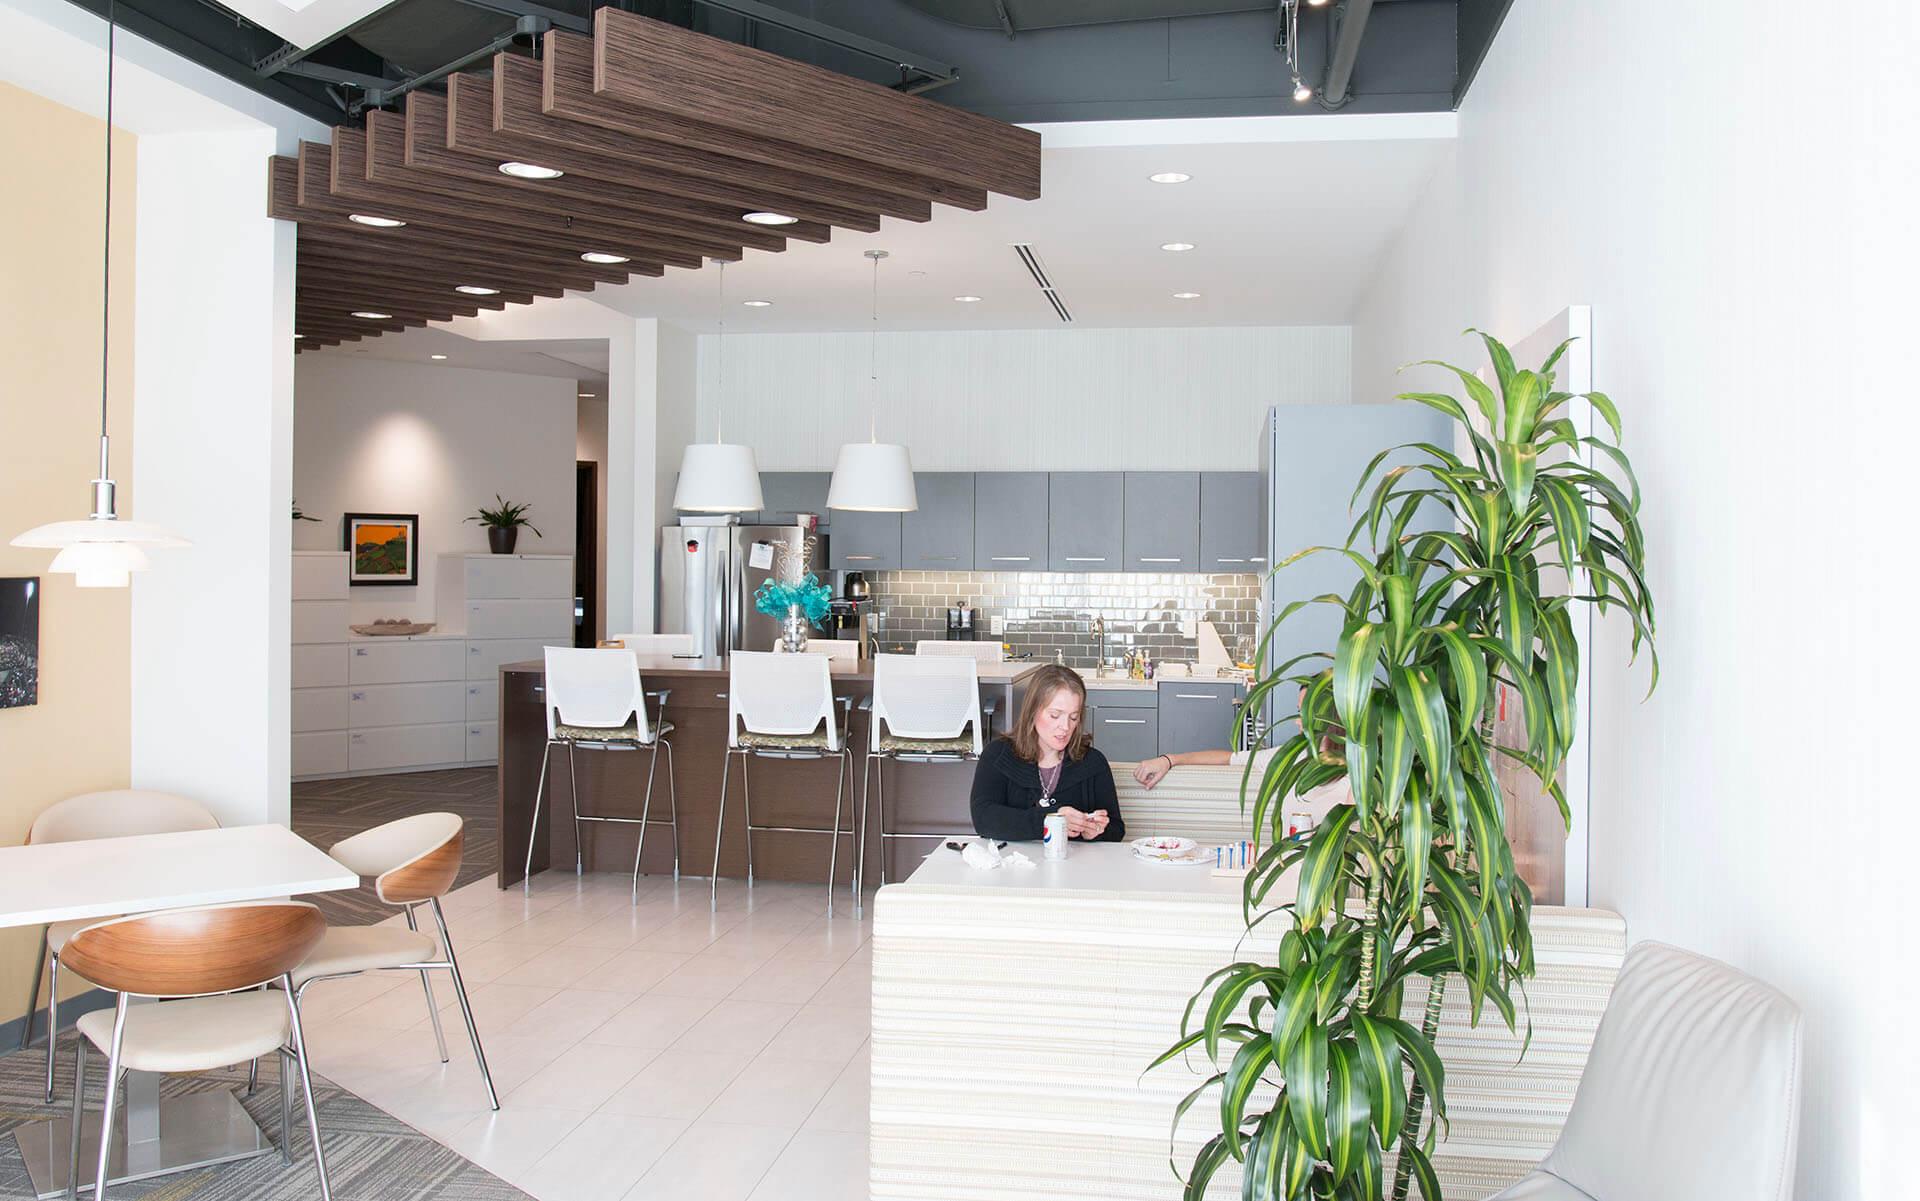 Kitchen & break room in Warner Norcross + Judd office